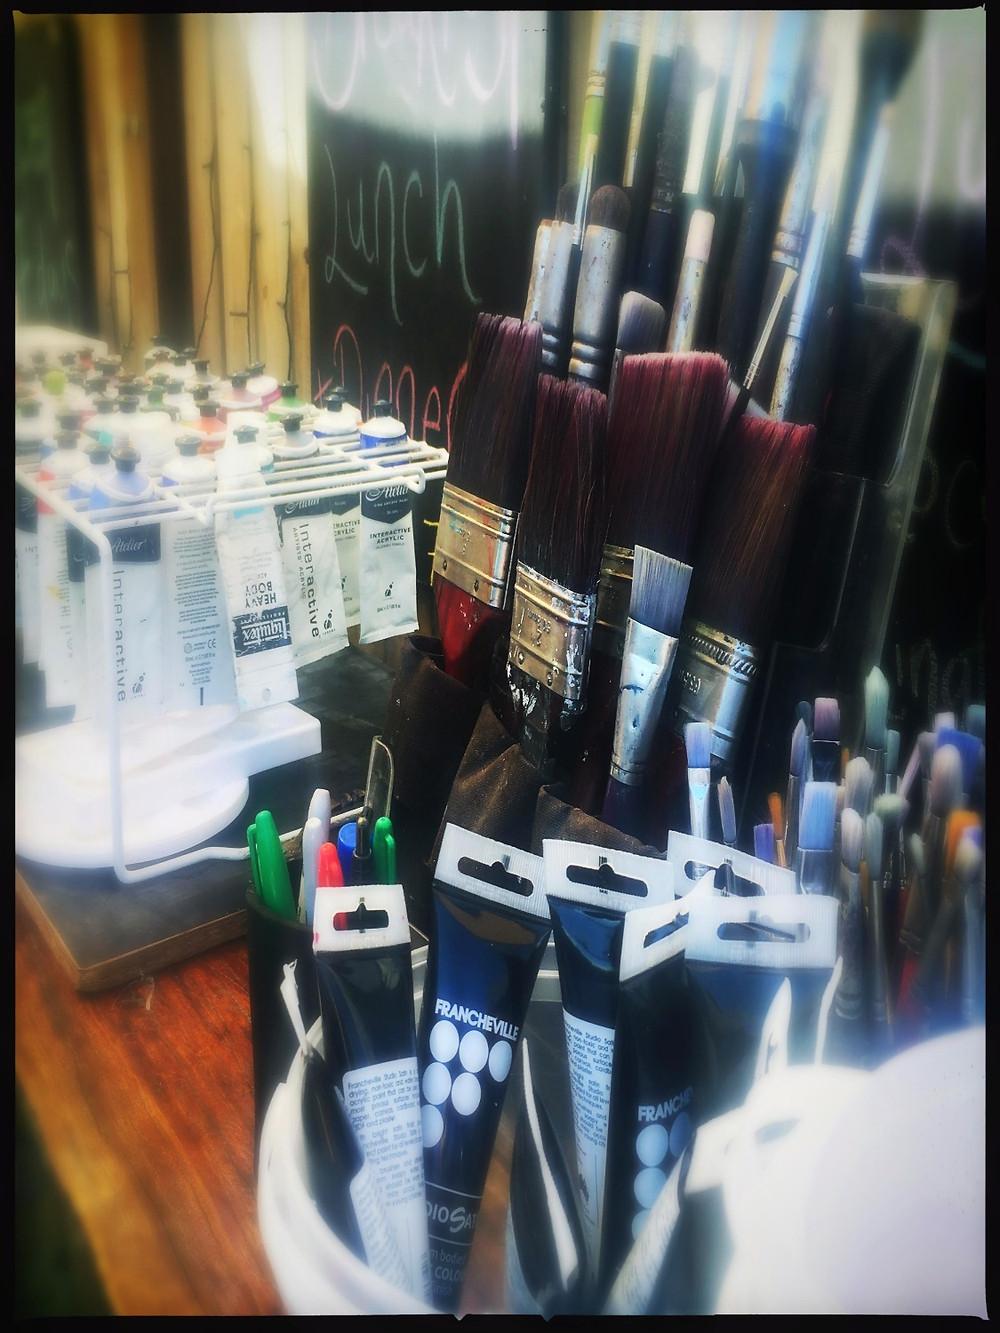 Art Supplies - Ready for Art on a Sunday